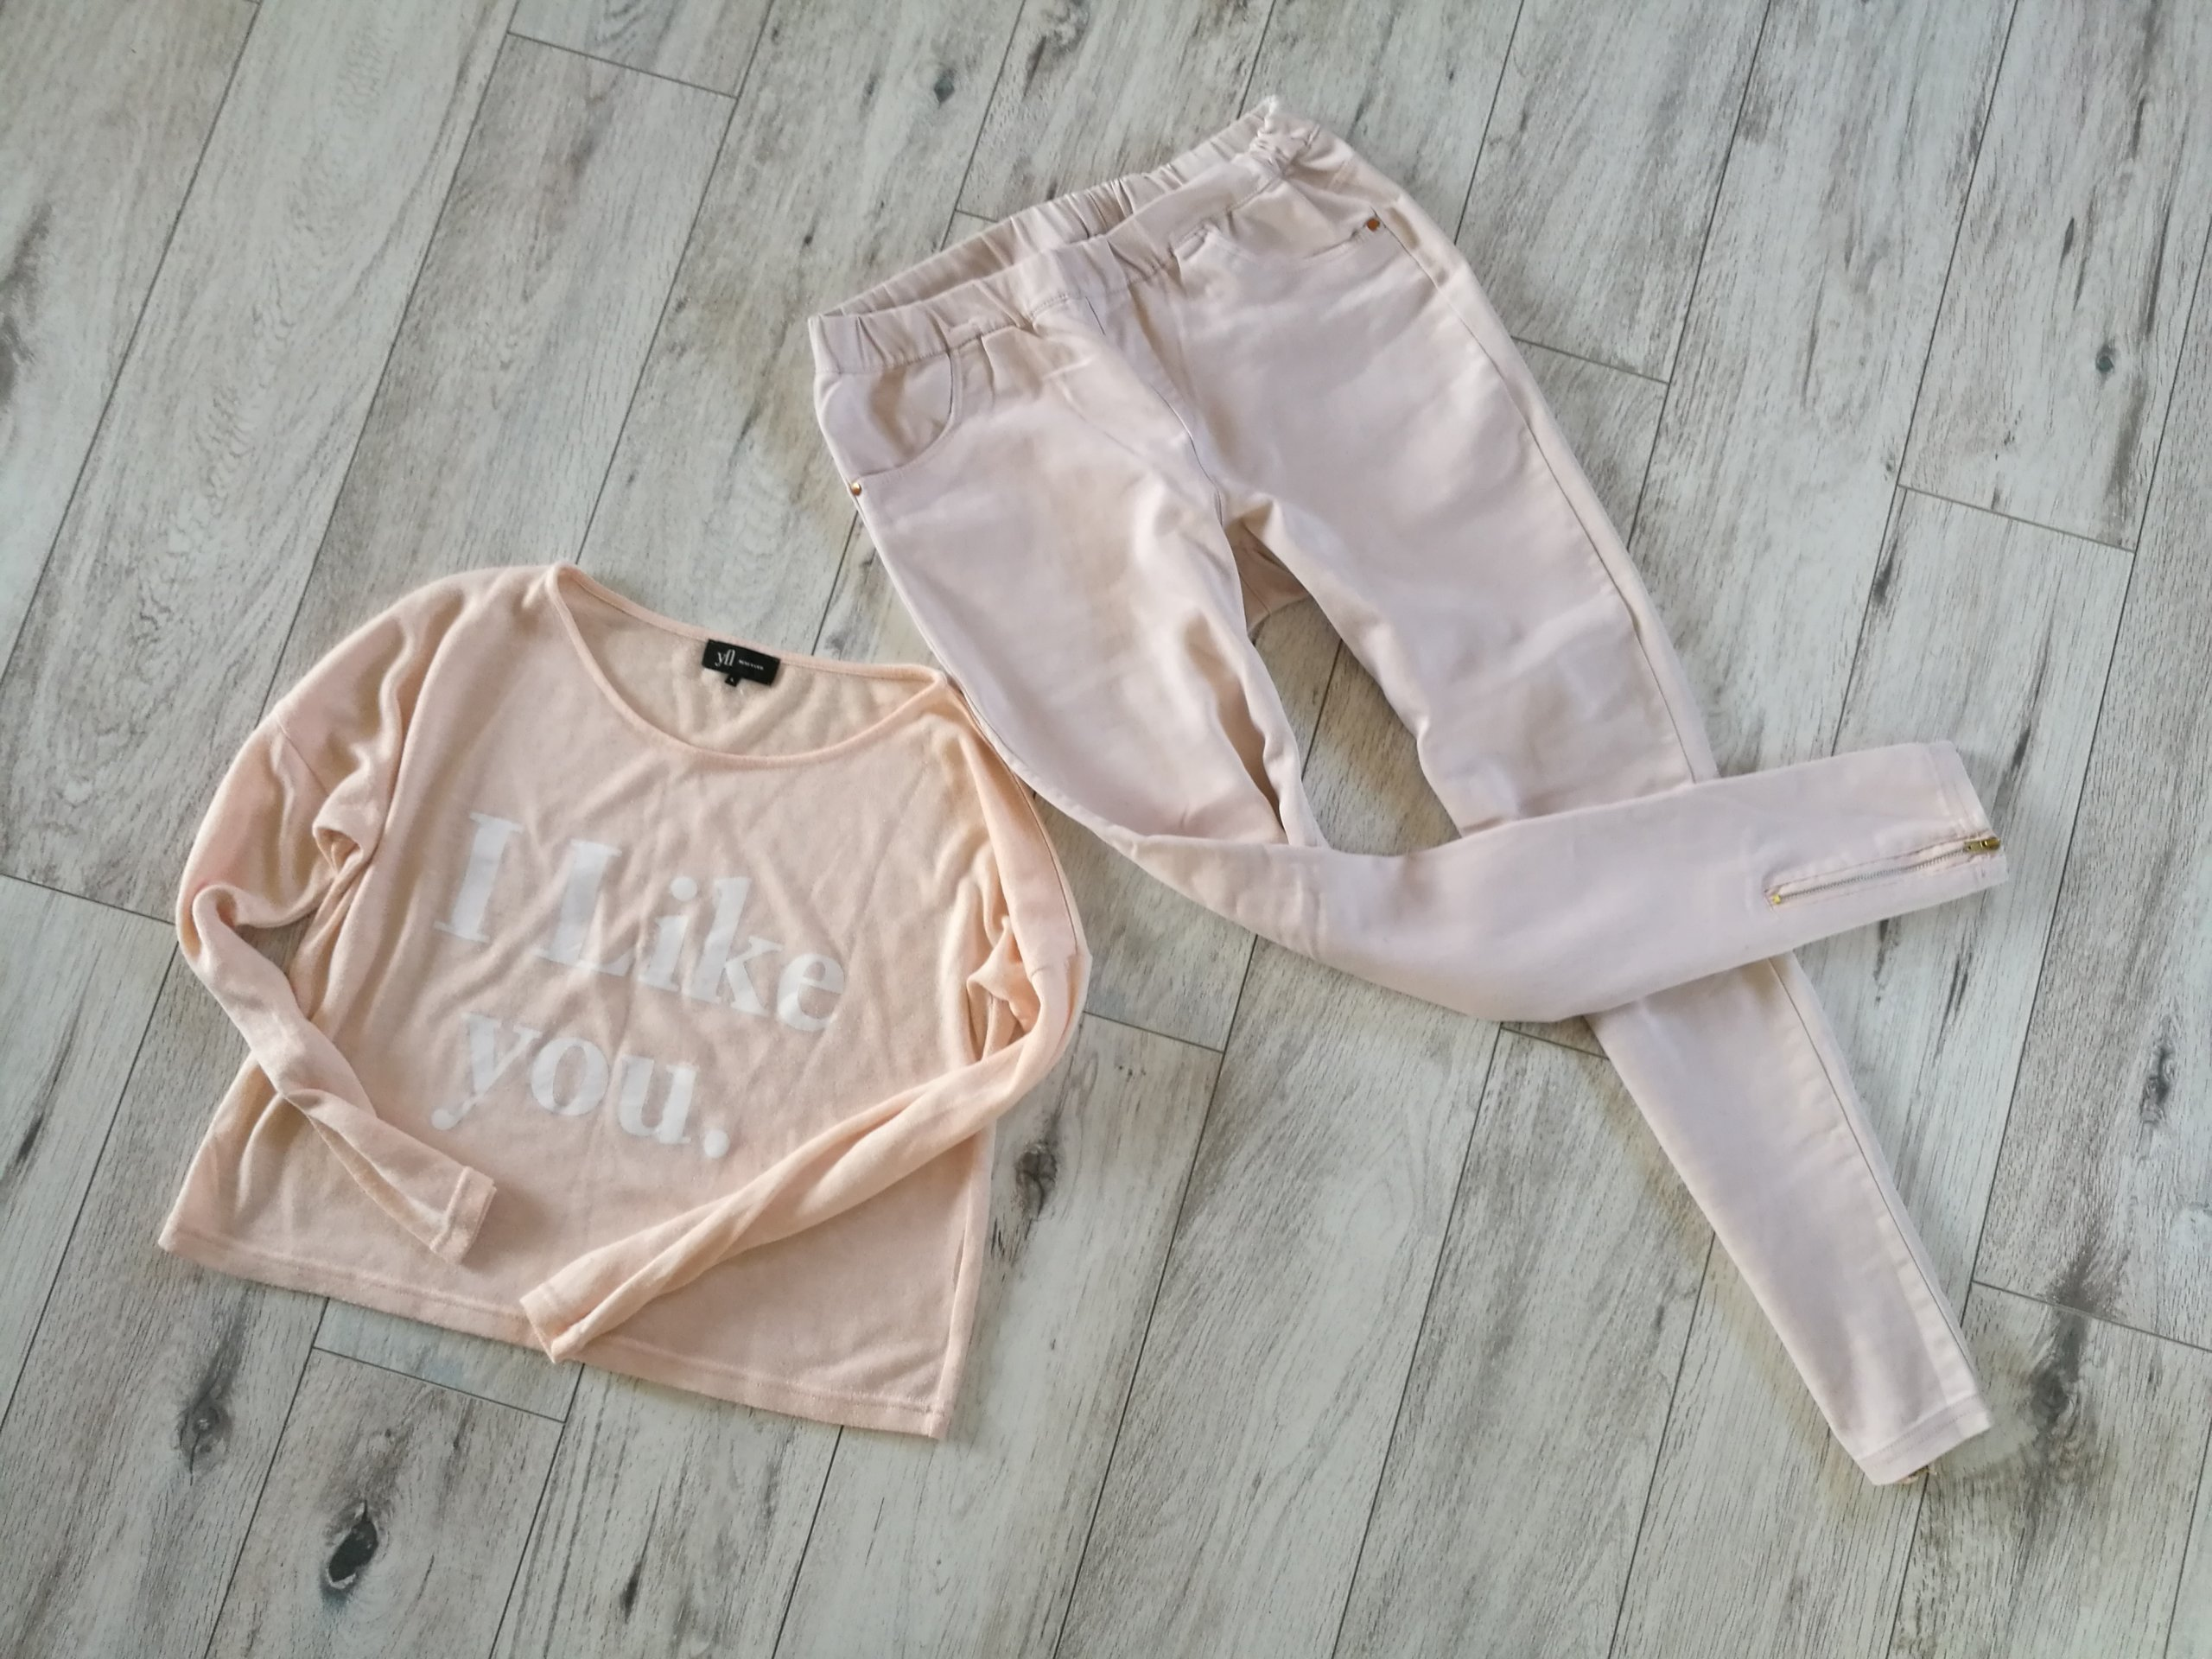 c4b71d91ca5ea KOMPLET_pastelowa bluzka reserved i spodnie zipy_L - 7334928273 - oficjalne  archiwum allegro